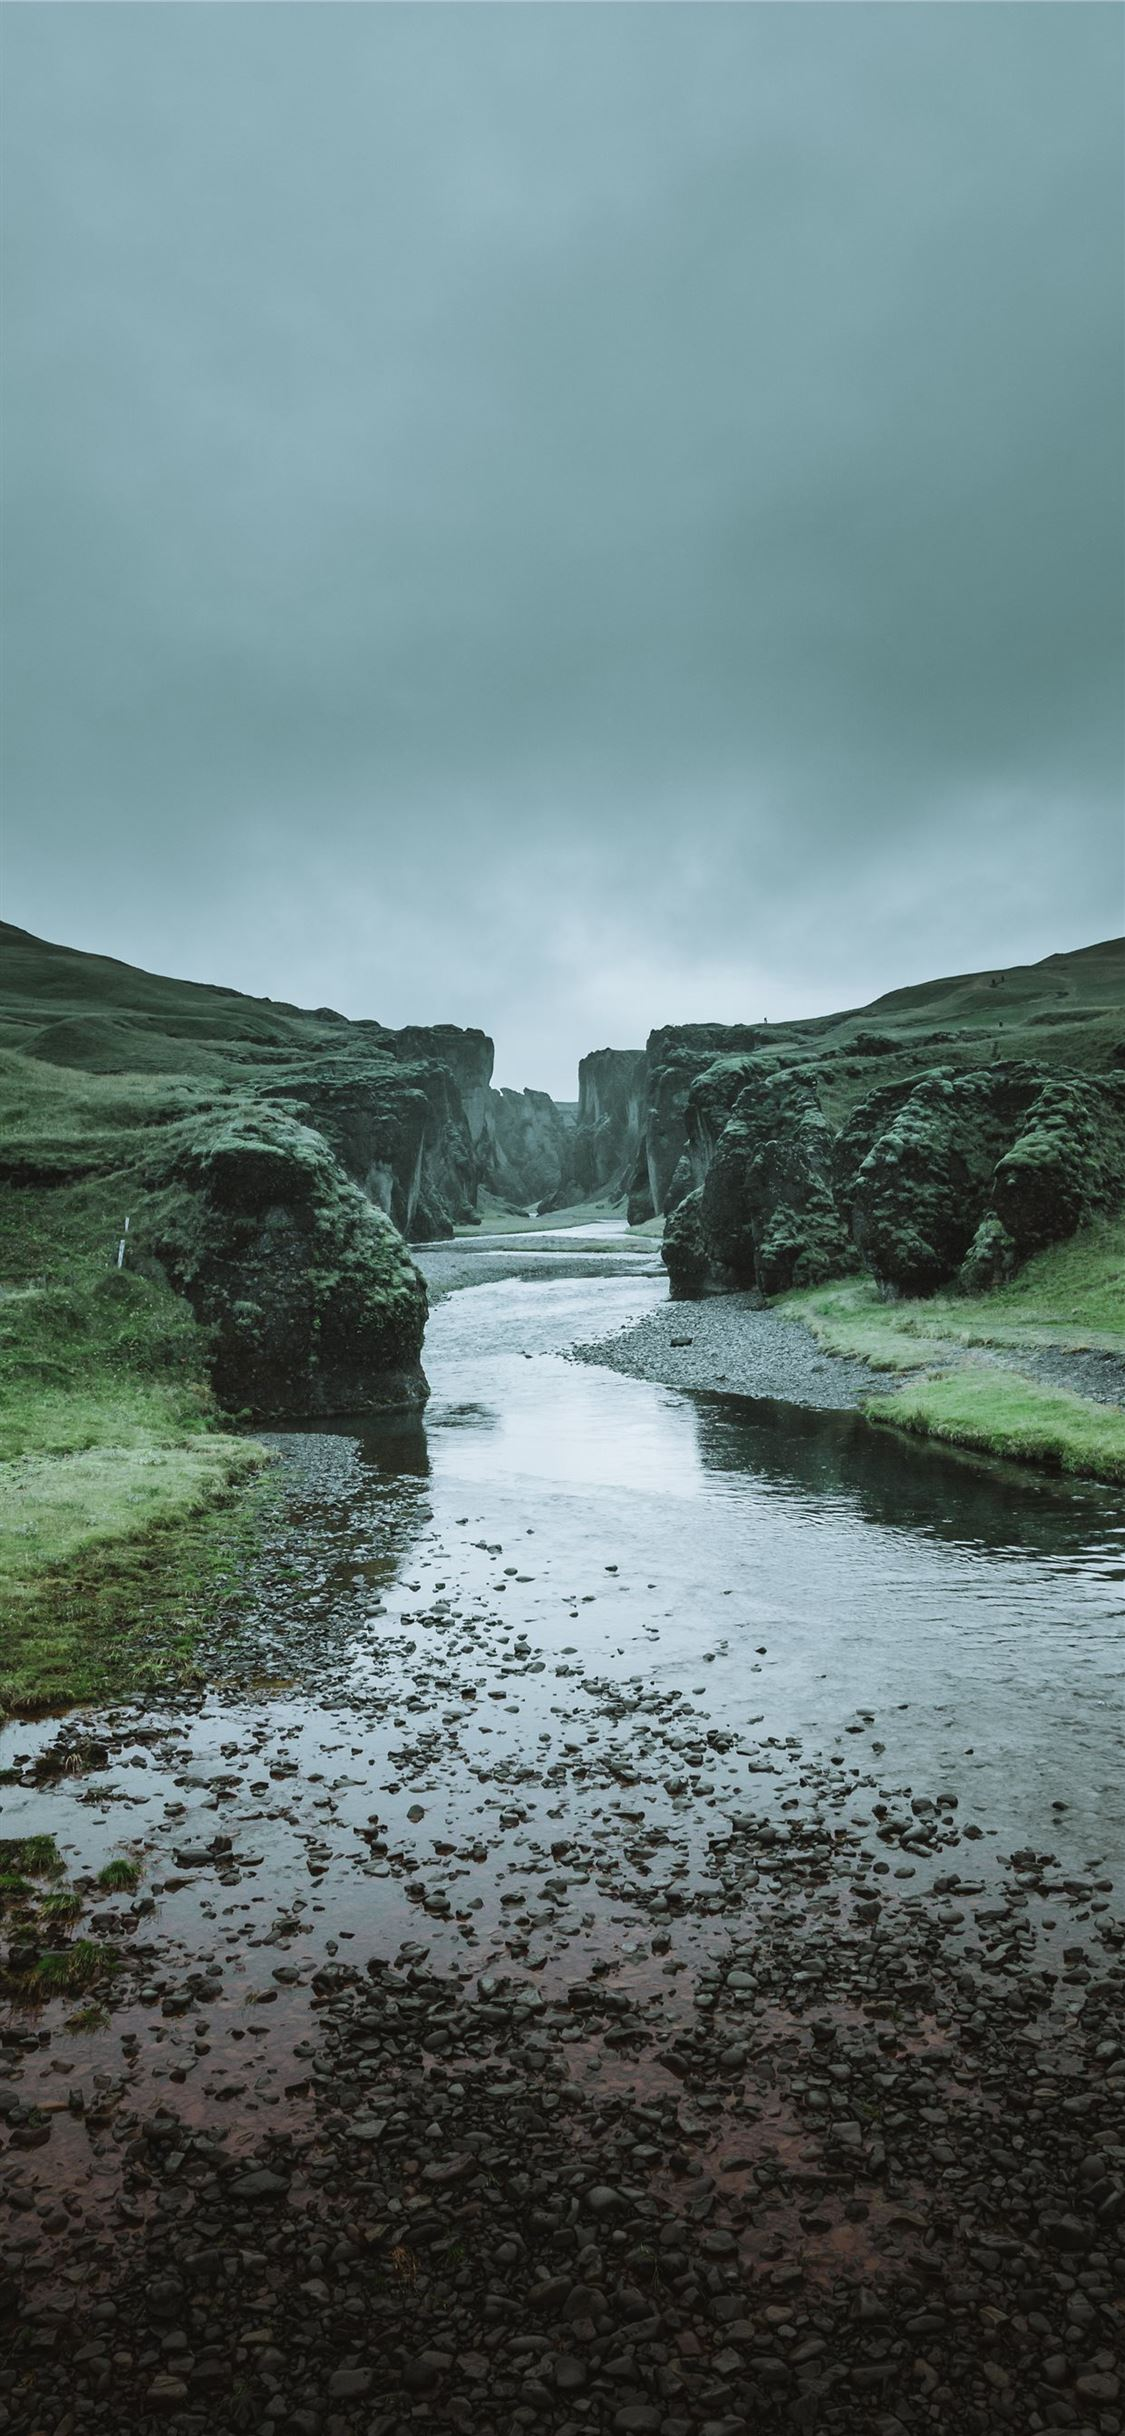 River Stream Coast Steep Stony Ditch Faroe Islands iPhone X 1125x2436